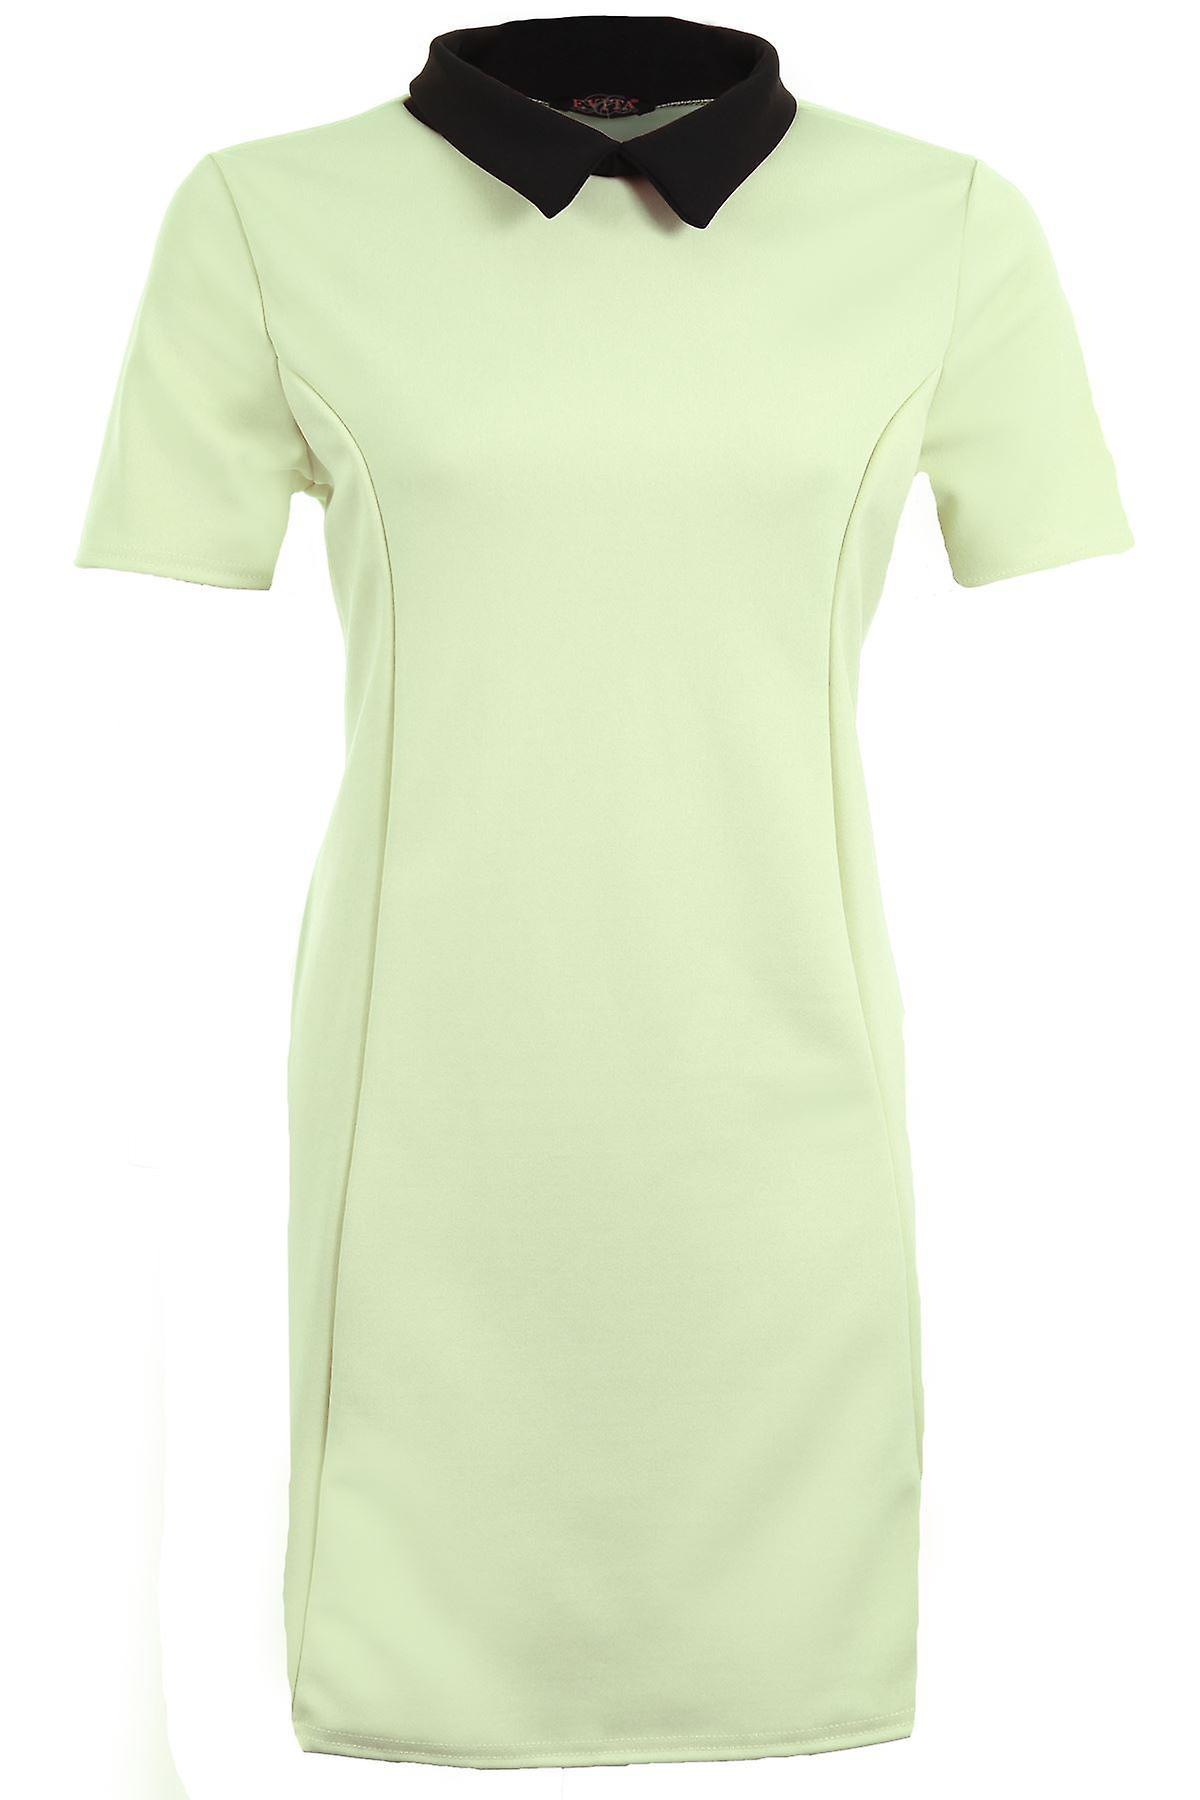 Ladies Short Sleeve Plain Peter Pan Collar Contrast Bodycon Plus Women's Dress